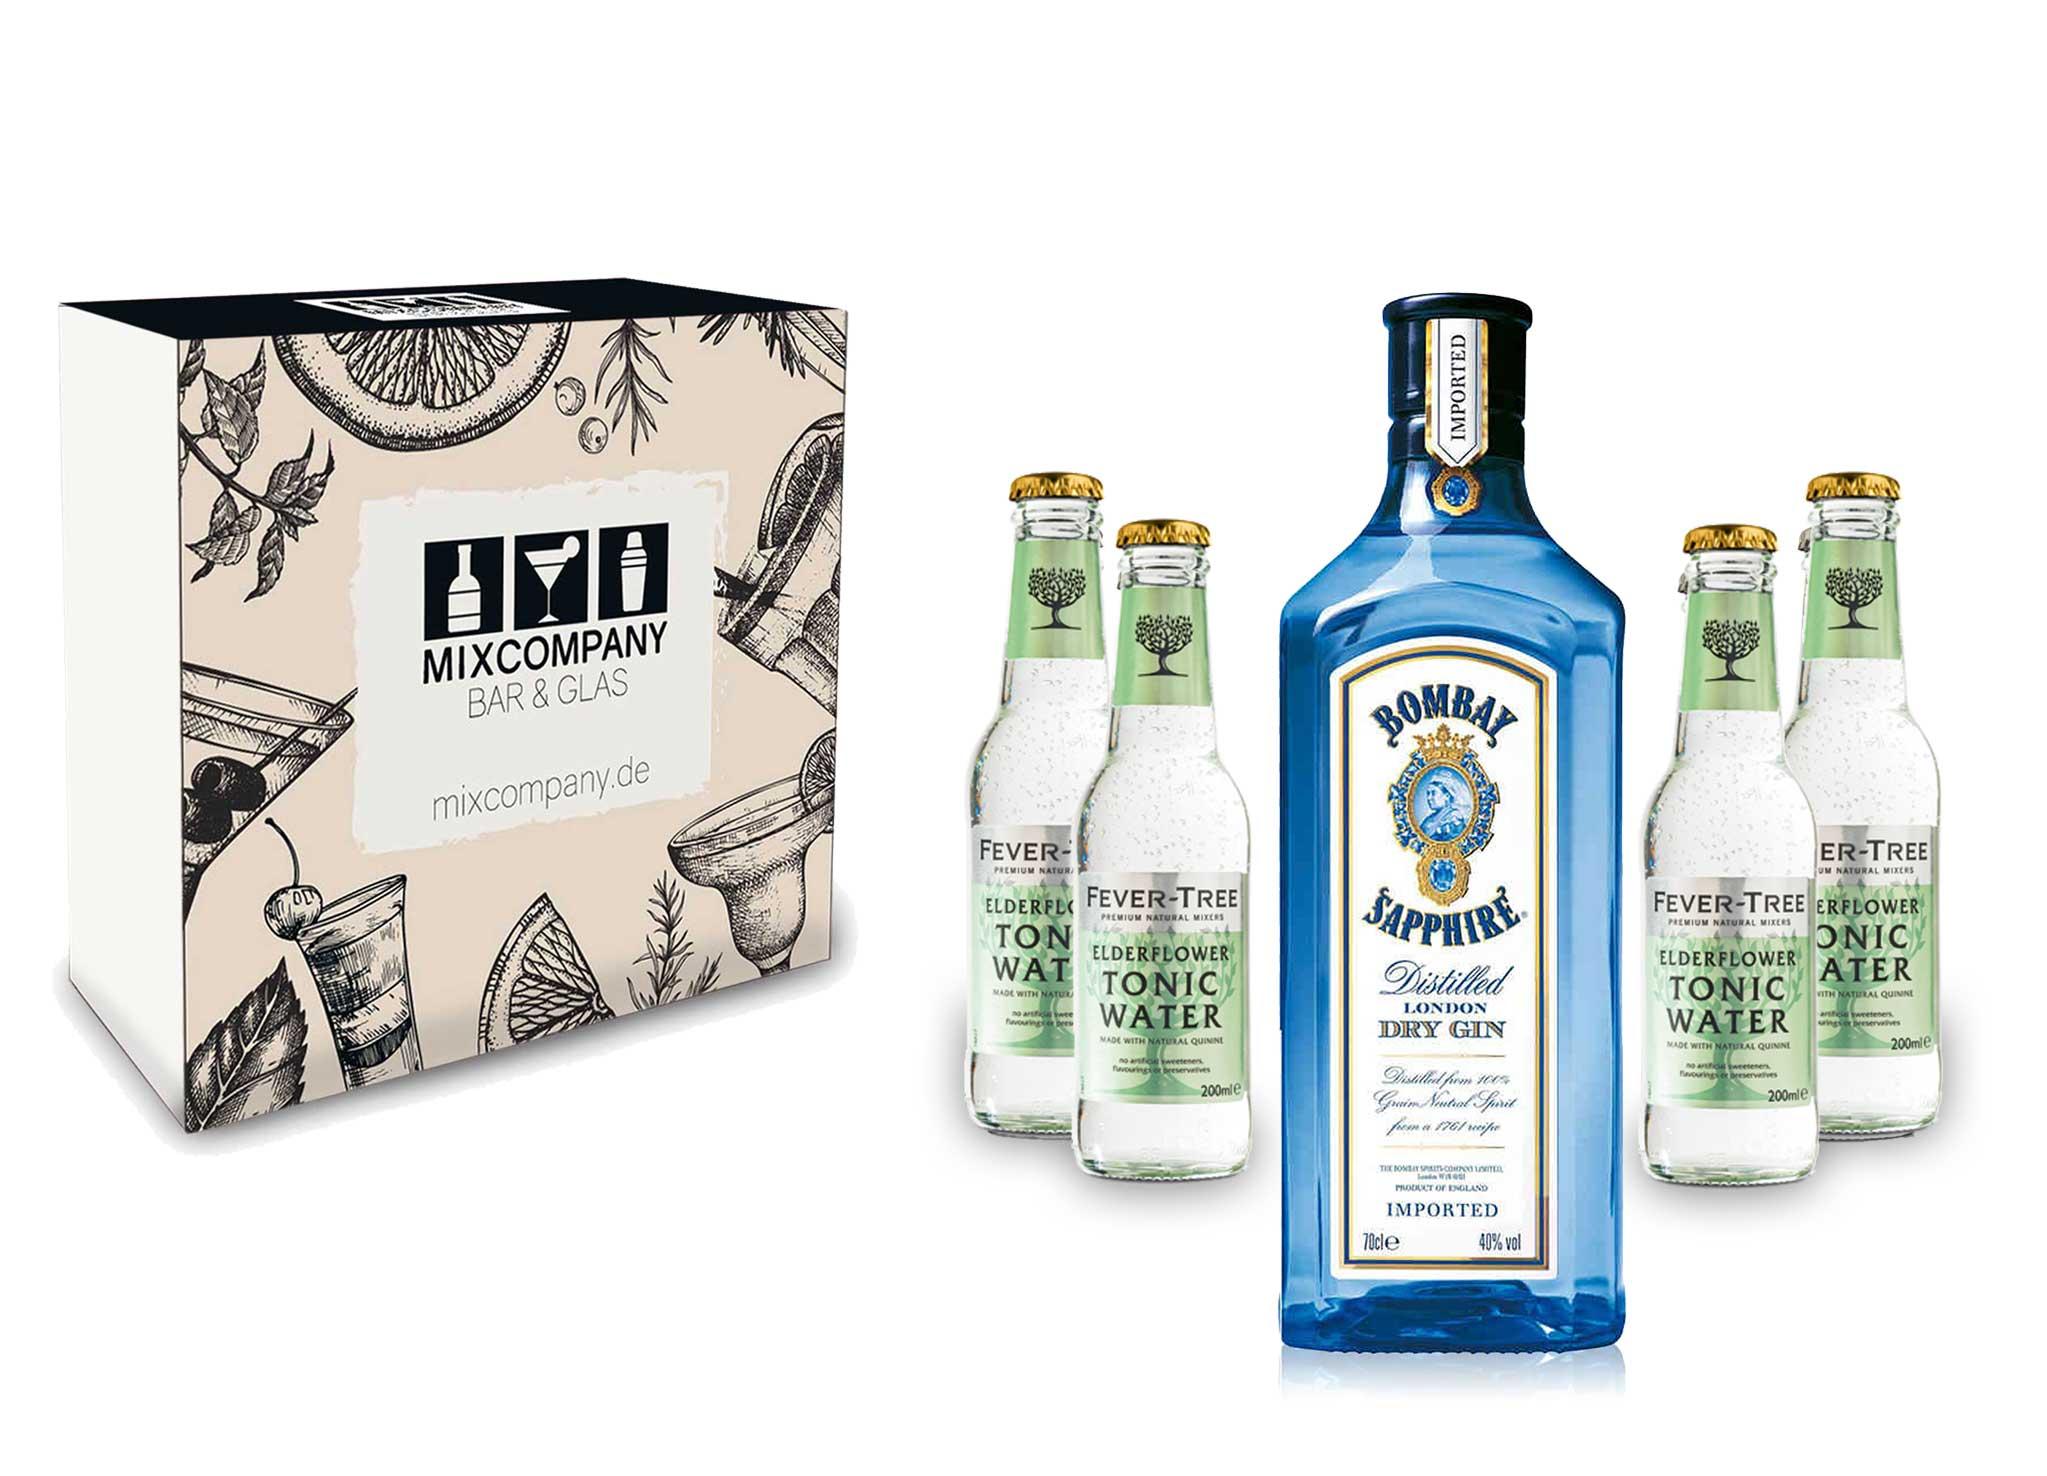 Gin Tonic Giftbox Geschenkset - Bombay Sapphire 0,7l 700ml (40% Vol) + 4x Fever Tree Elderflower Tonic Water 200ml inkl. Pfand MEHRWEG + Geschenkverpackung